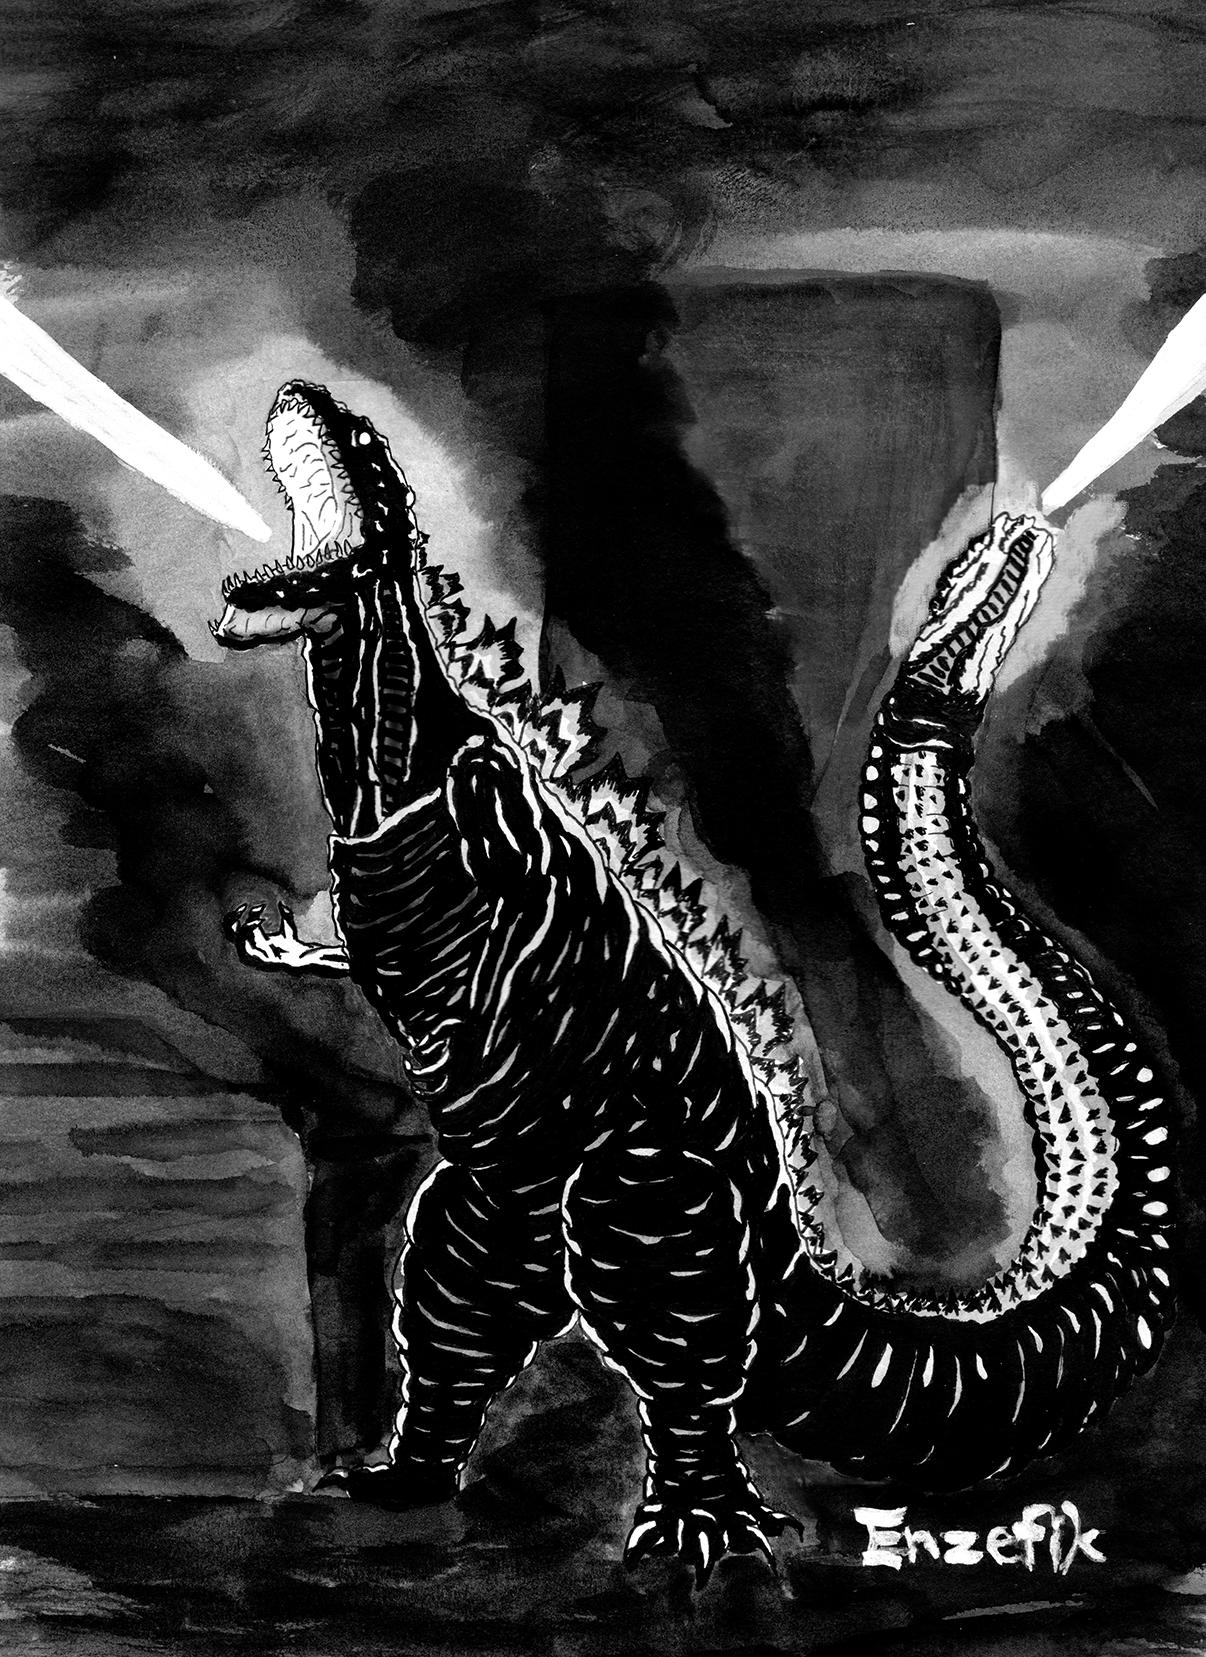 Inktober: Godzilla